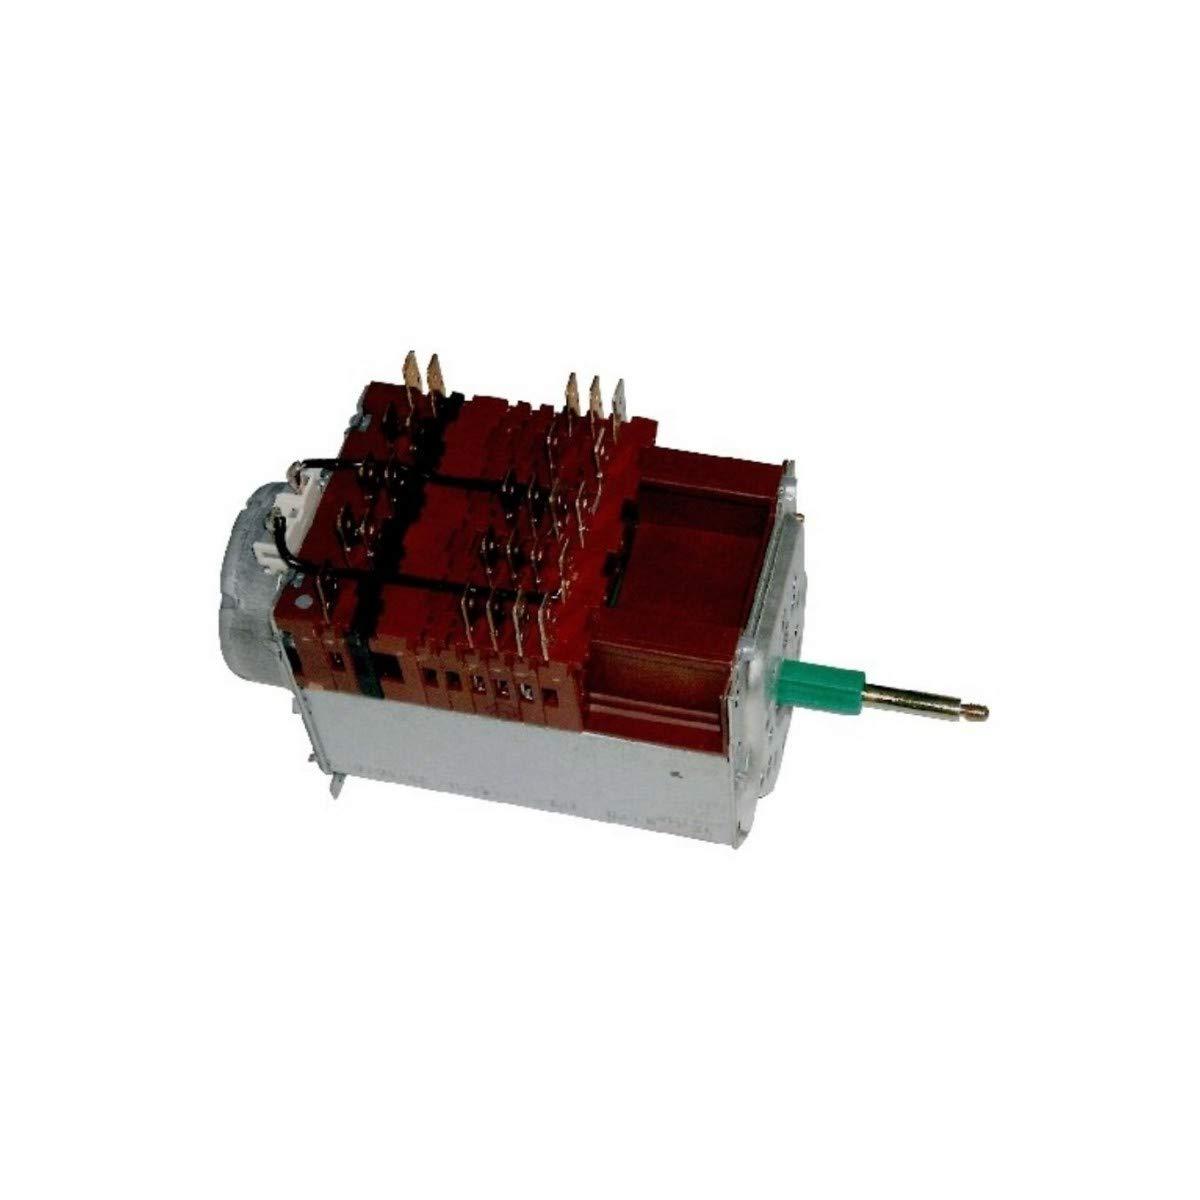 Recamania Programador Lavadora Zanussi FLS434 1247059148 ...